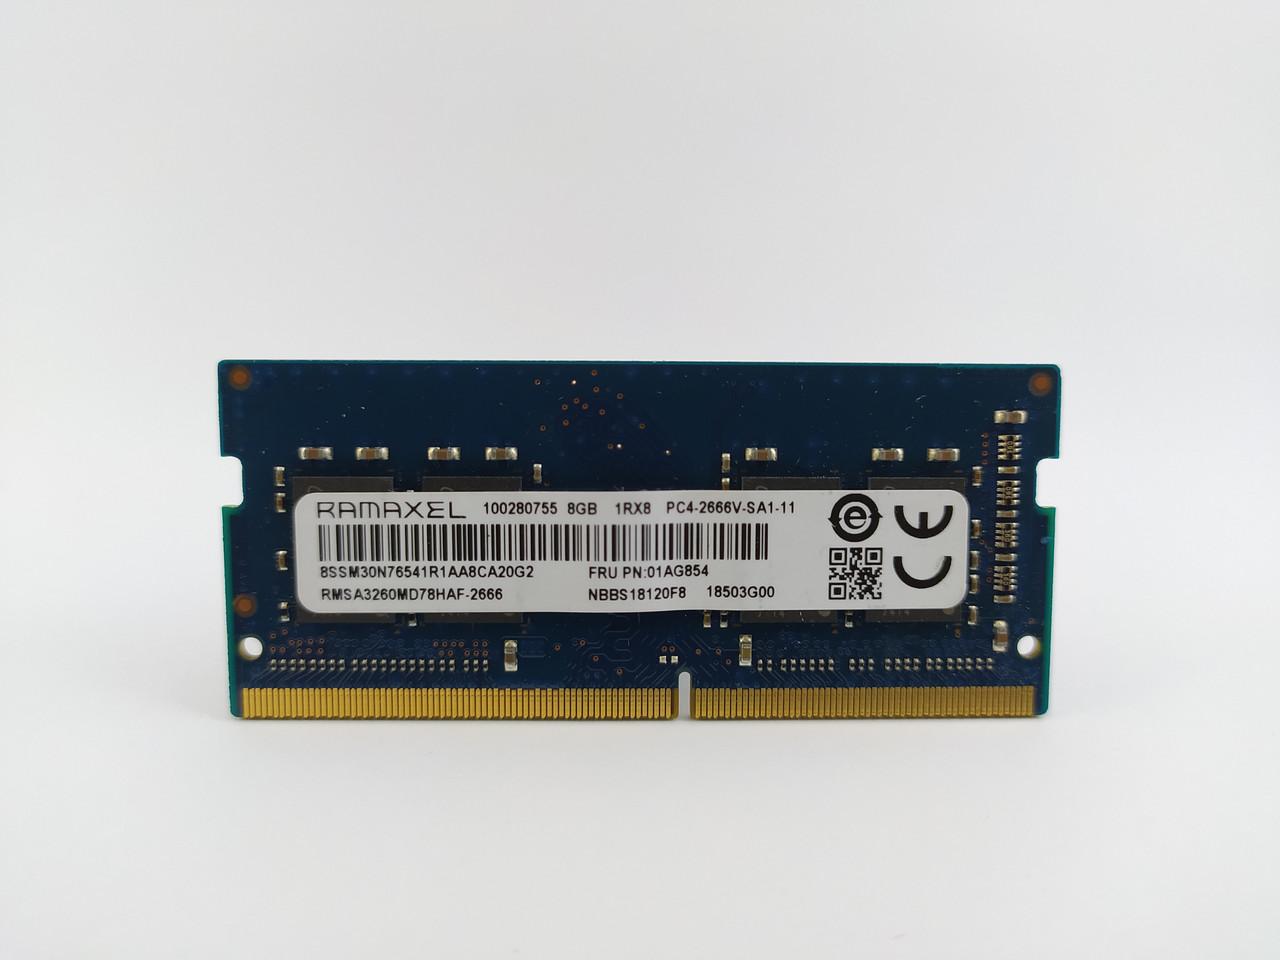 Оперативная память для ноутбука SODIMM Ramaxel DDR4 8Gb PC4-2666V (RMSA3260MD78HAF-2666) Б/У